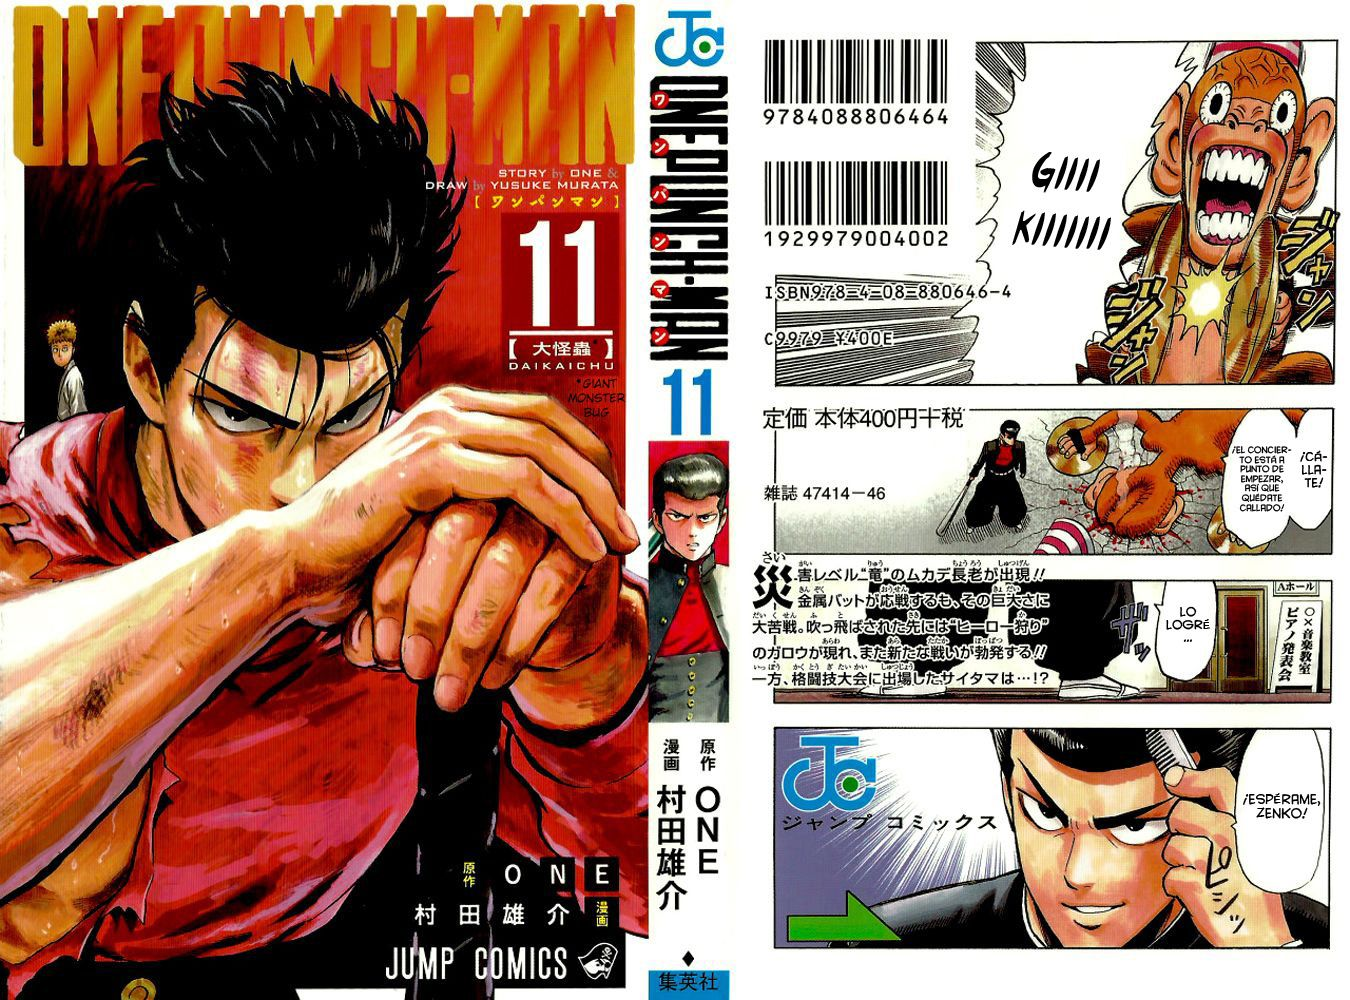 http://c5.ninemanga.com/es_manga/pic2/21/14805/517904/e2afceac9c51a3cd751b87eaf4cf0236.jpg Page 2